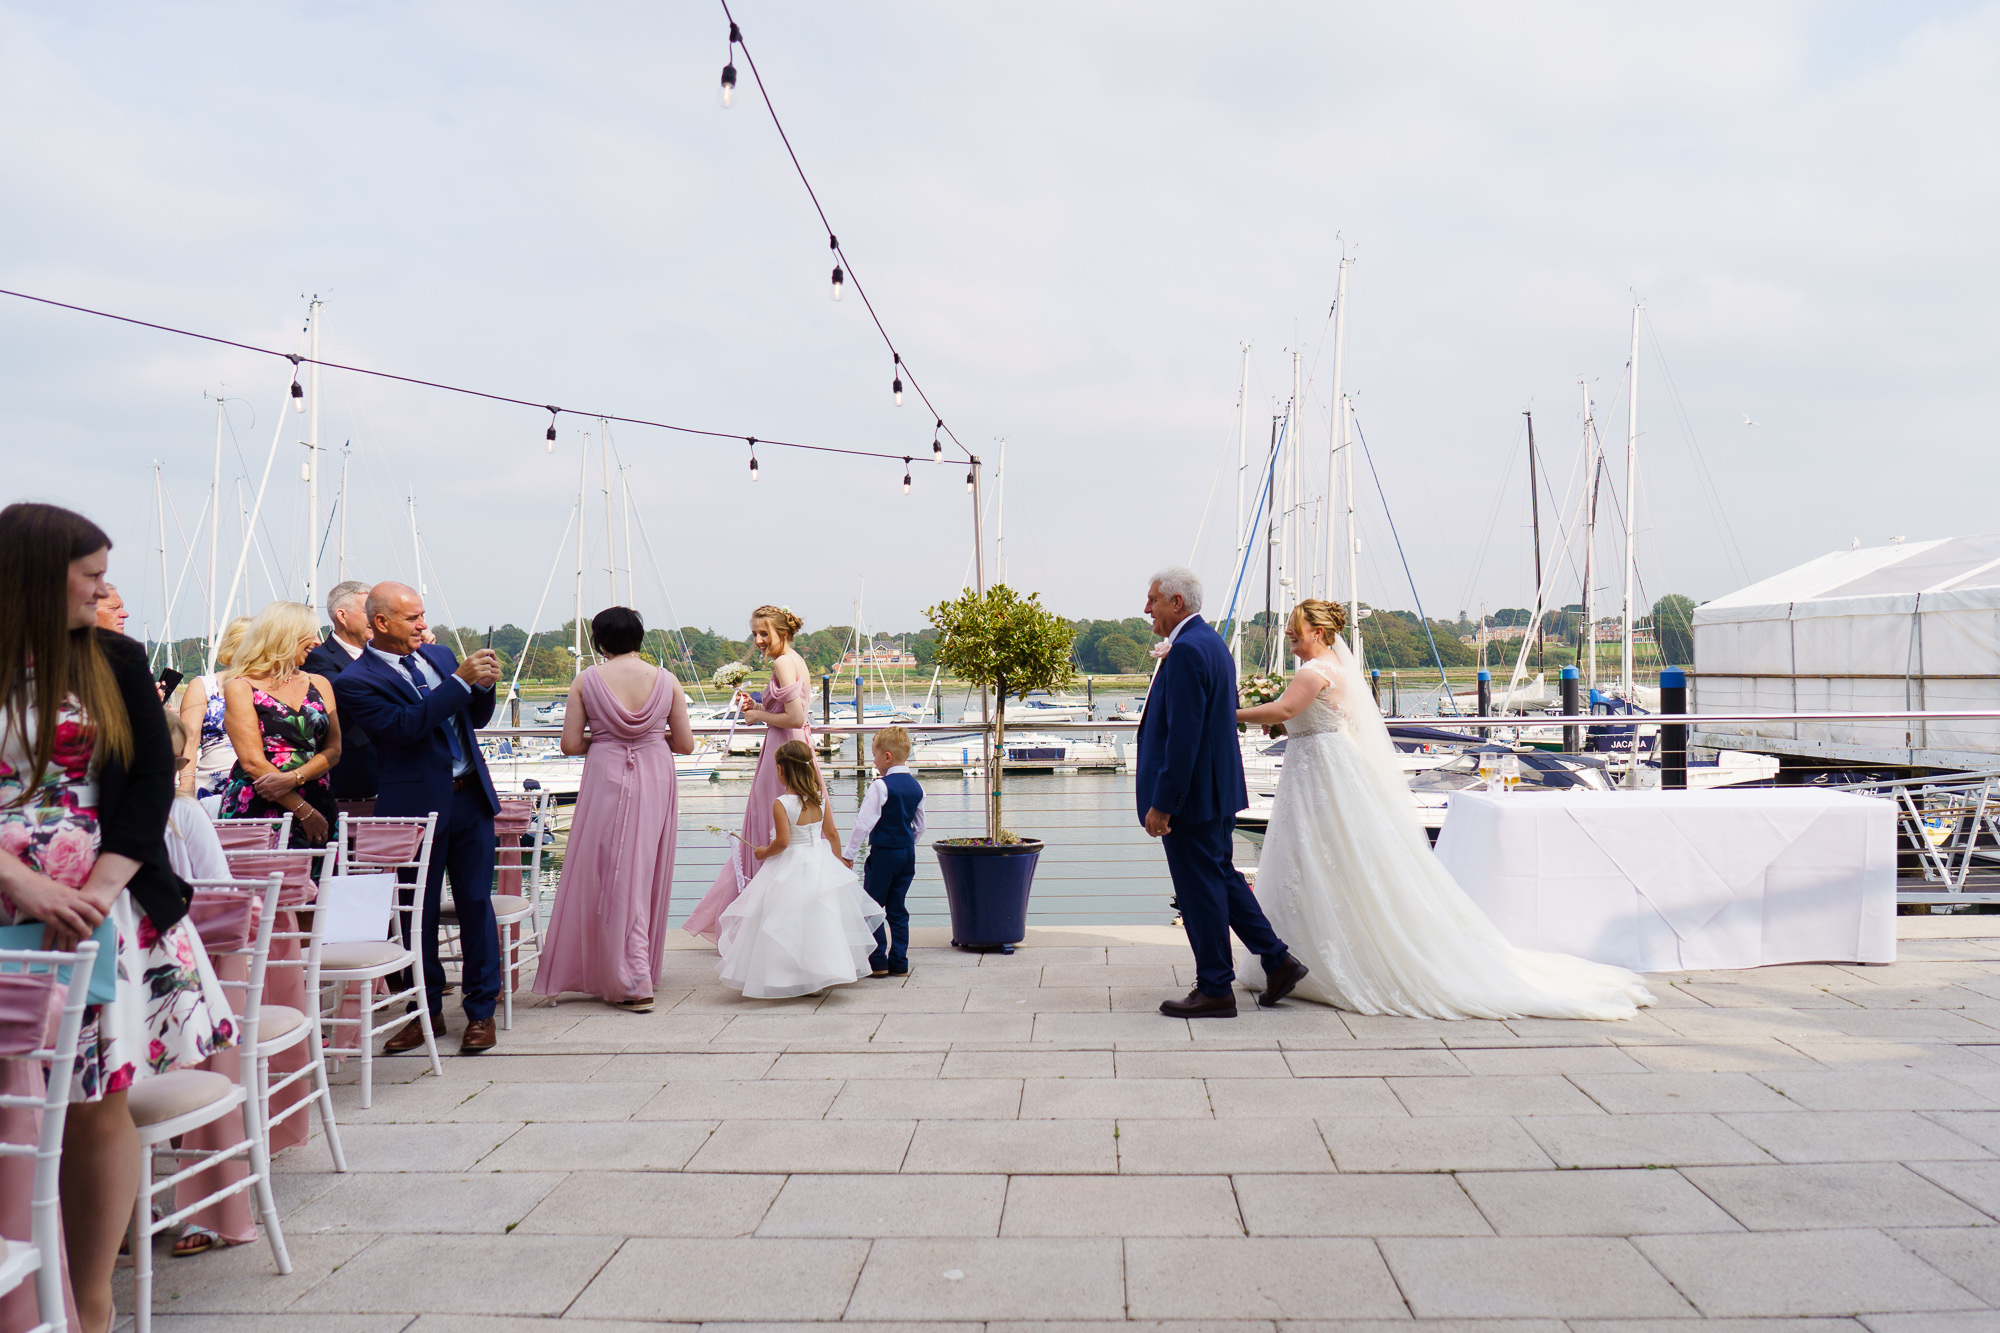 bridal party walking up the aisle at outdoor wedding at roayl southern yacht club